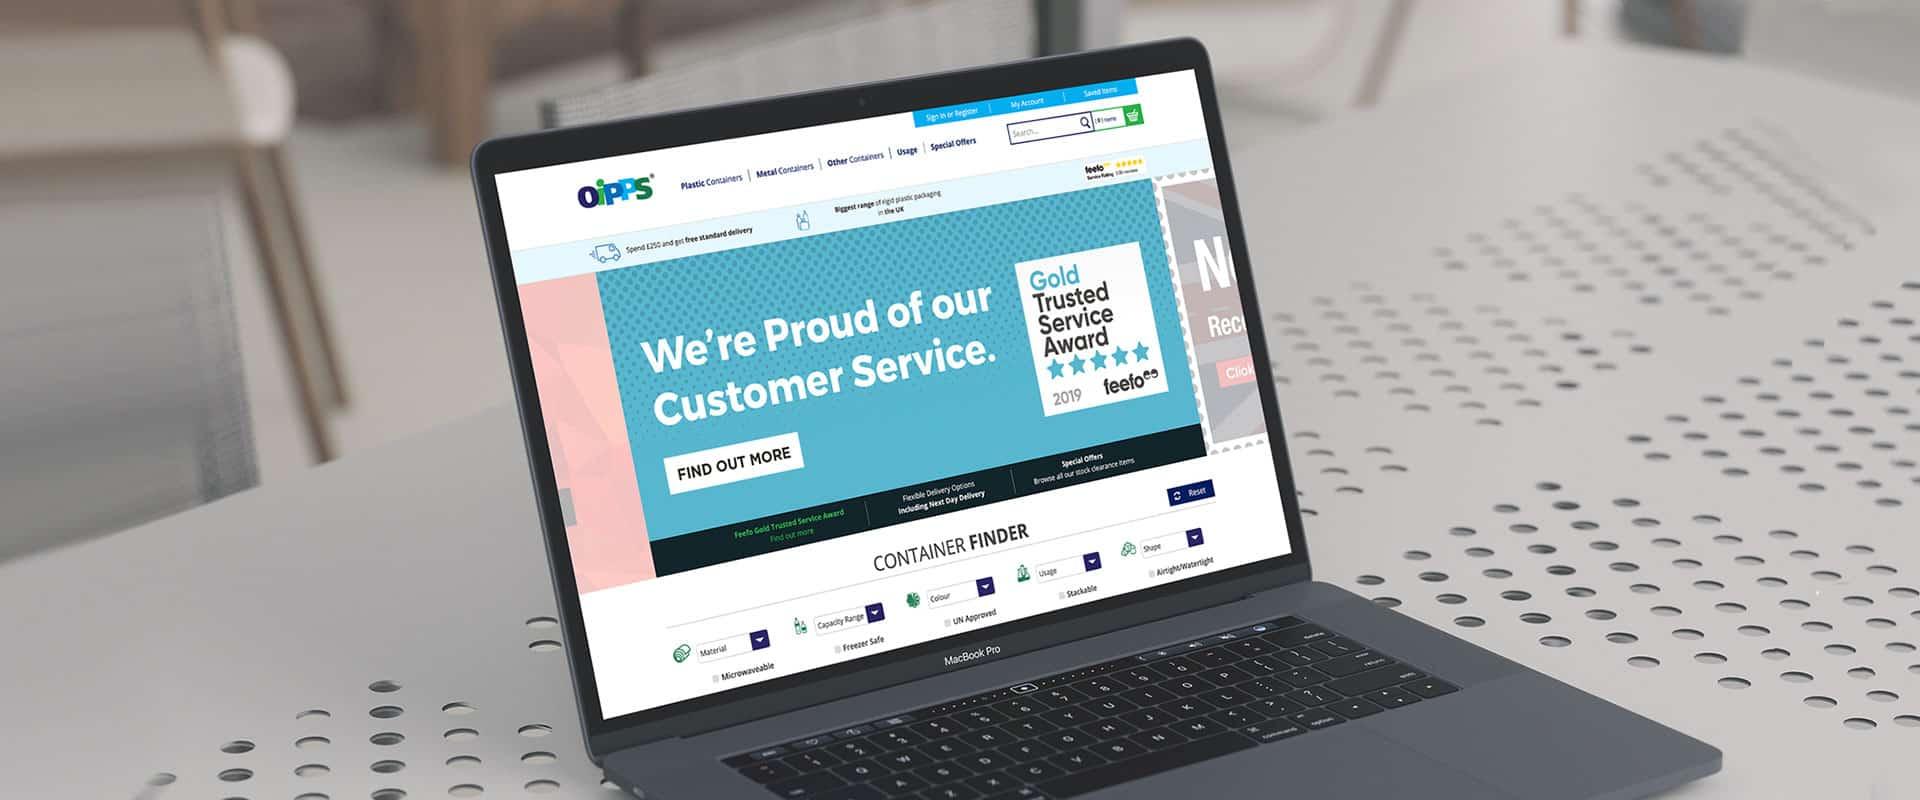 Oipps website shown on a laptop.